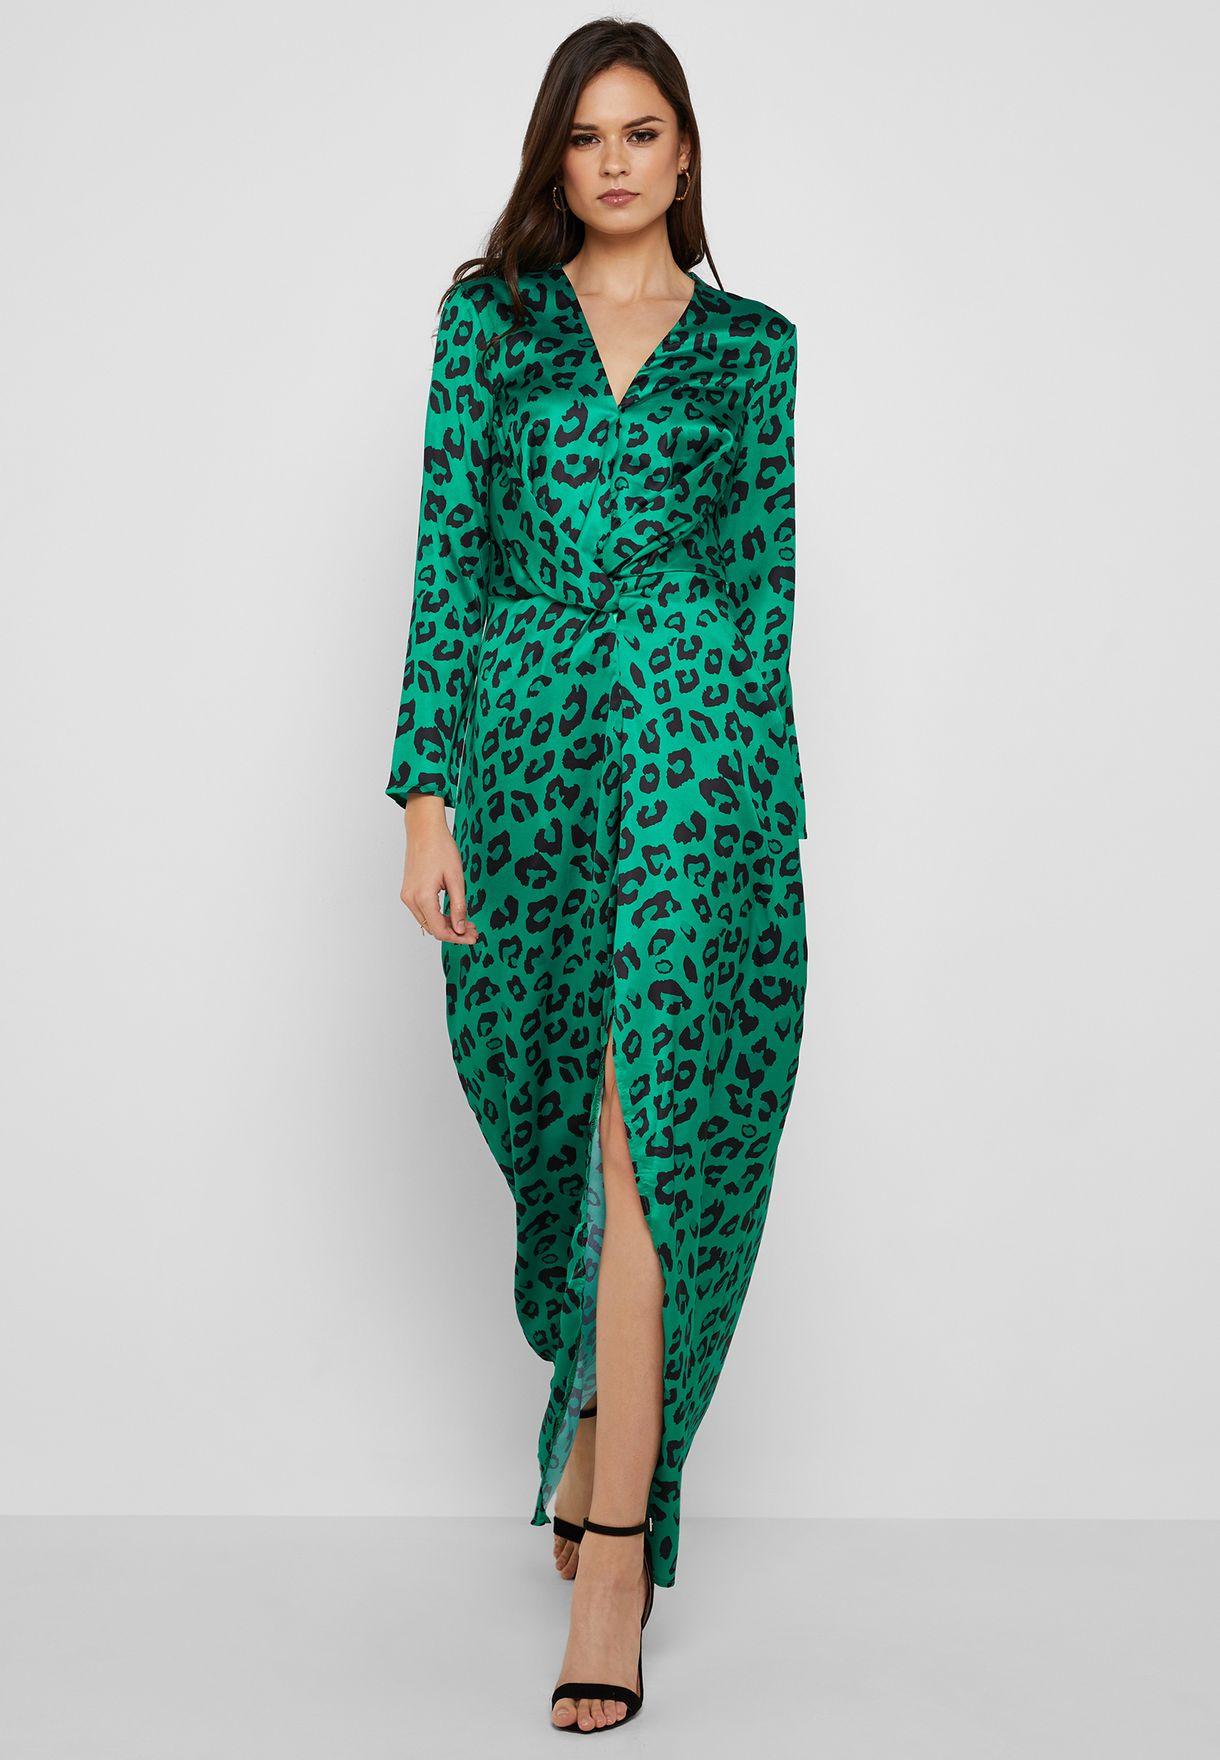 Leopard Print Twisted Front Maxi Dress